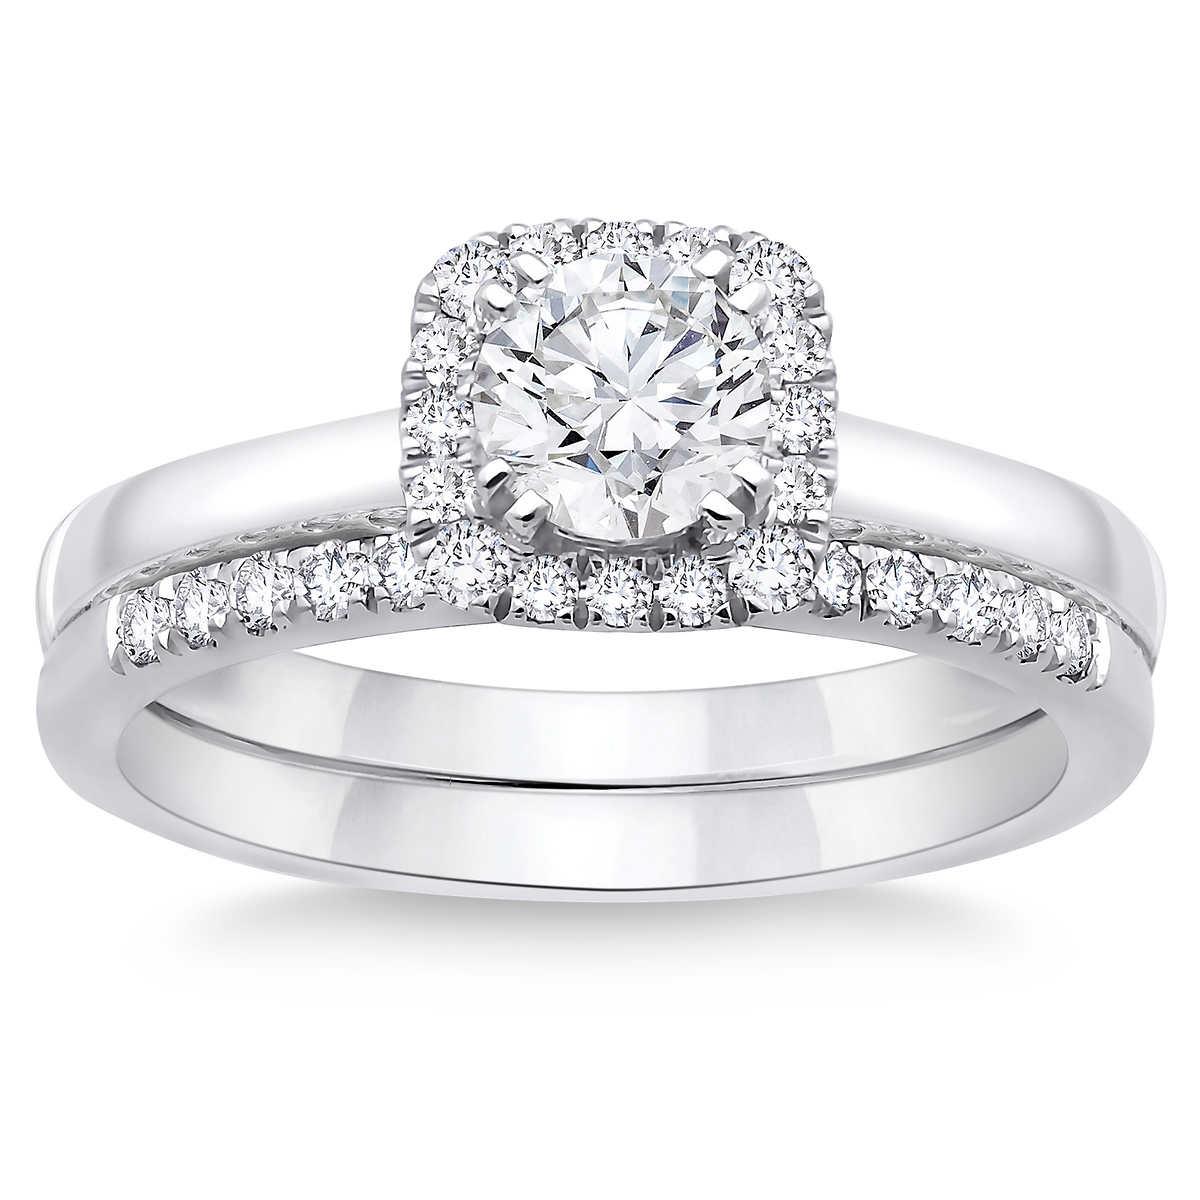 Round Brilliant 0 80 ctw VS2 Clarity 2C I Color Diamond Platinum Wedding Set product wedding set Click to Zoom